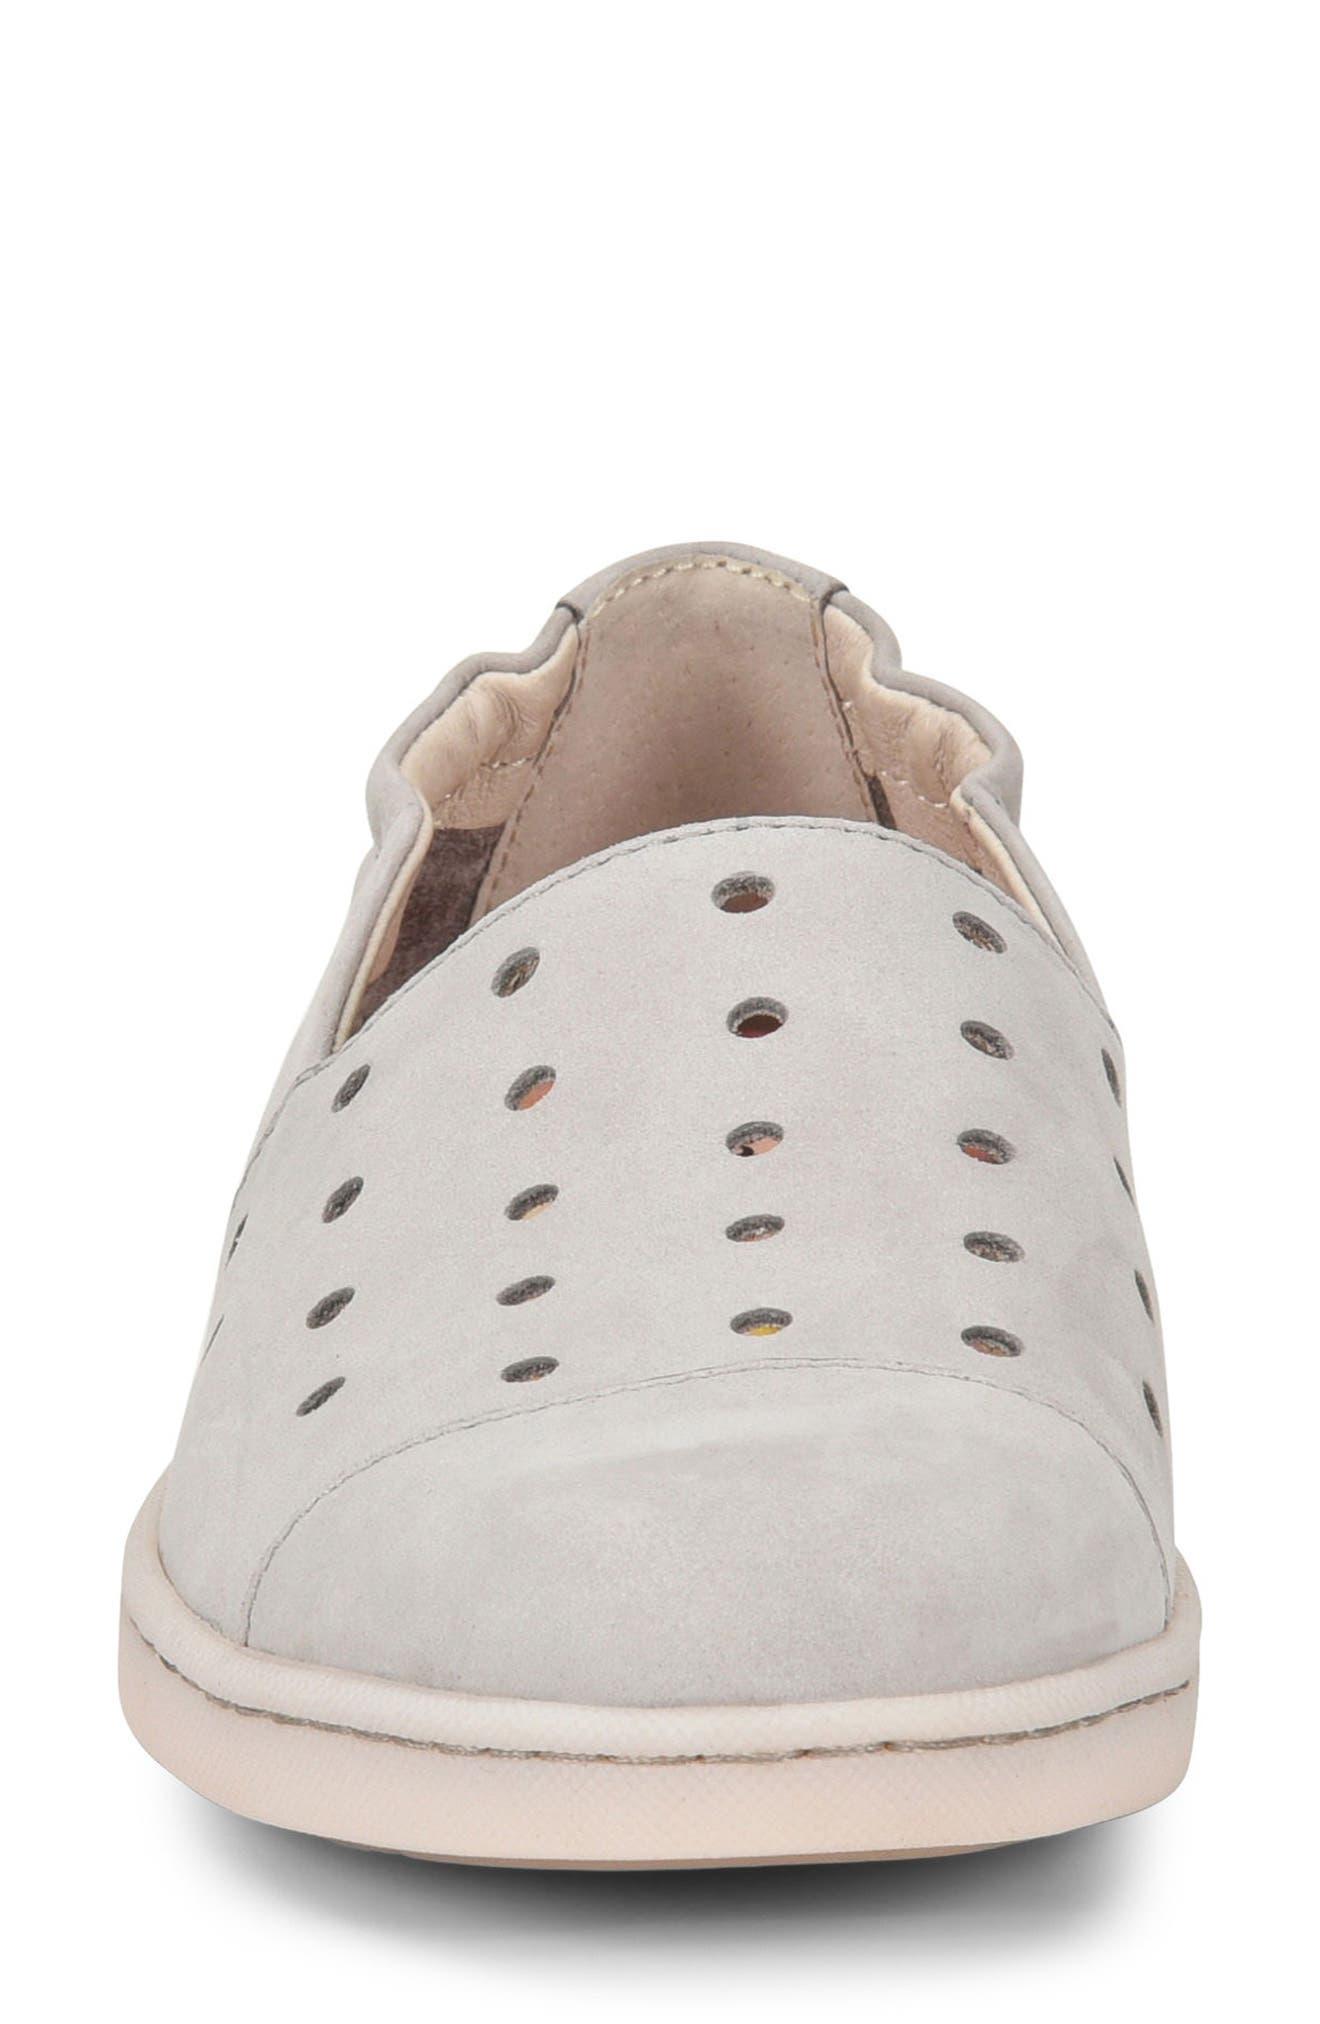 Kristin Sneaker,                             Alternate thumbnail 4, color,                             Light Grey Nubuck Leather